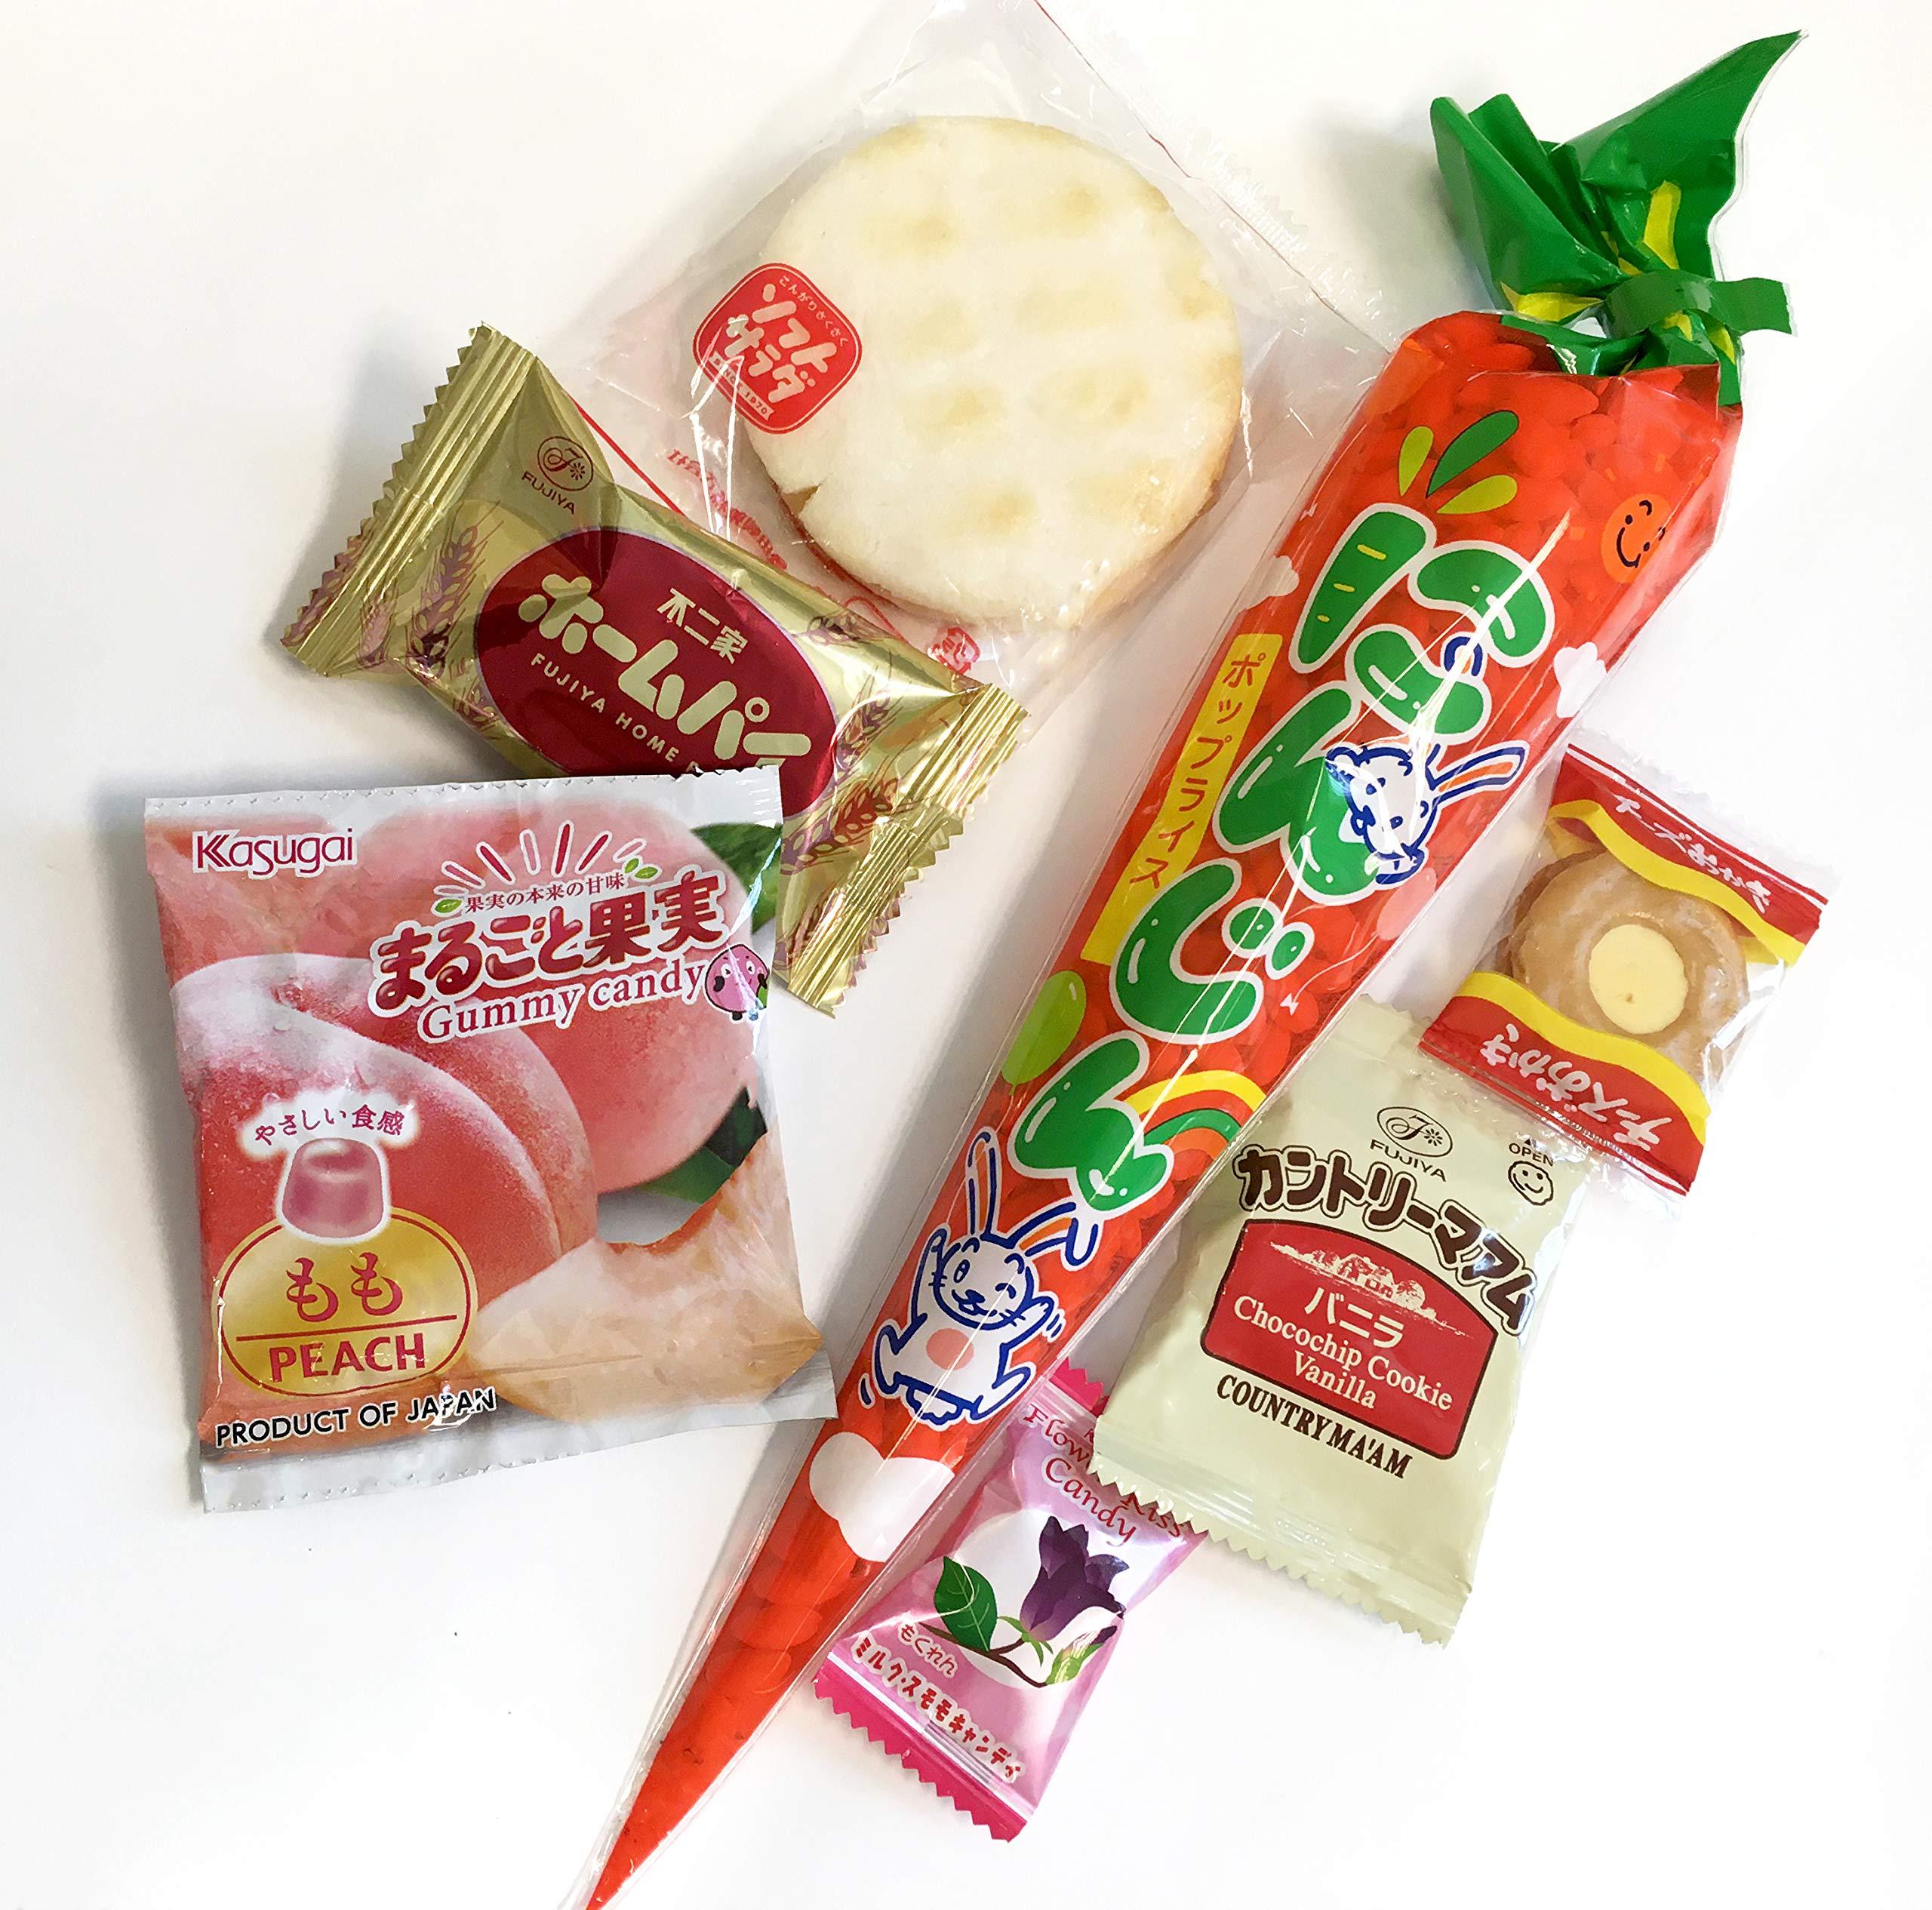 Samurai Dagashi Set, Japanese Snack Assortment 36pc with Samurai Kid sticker